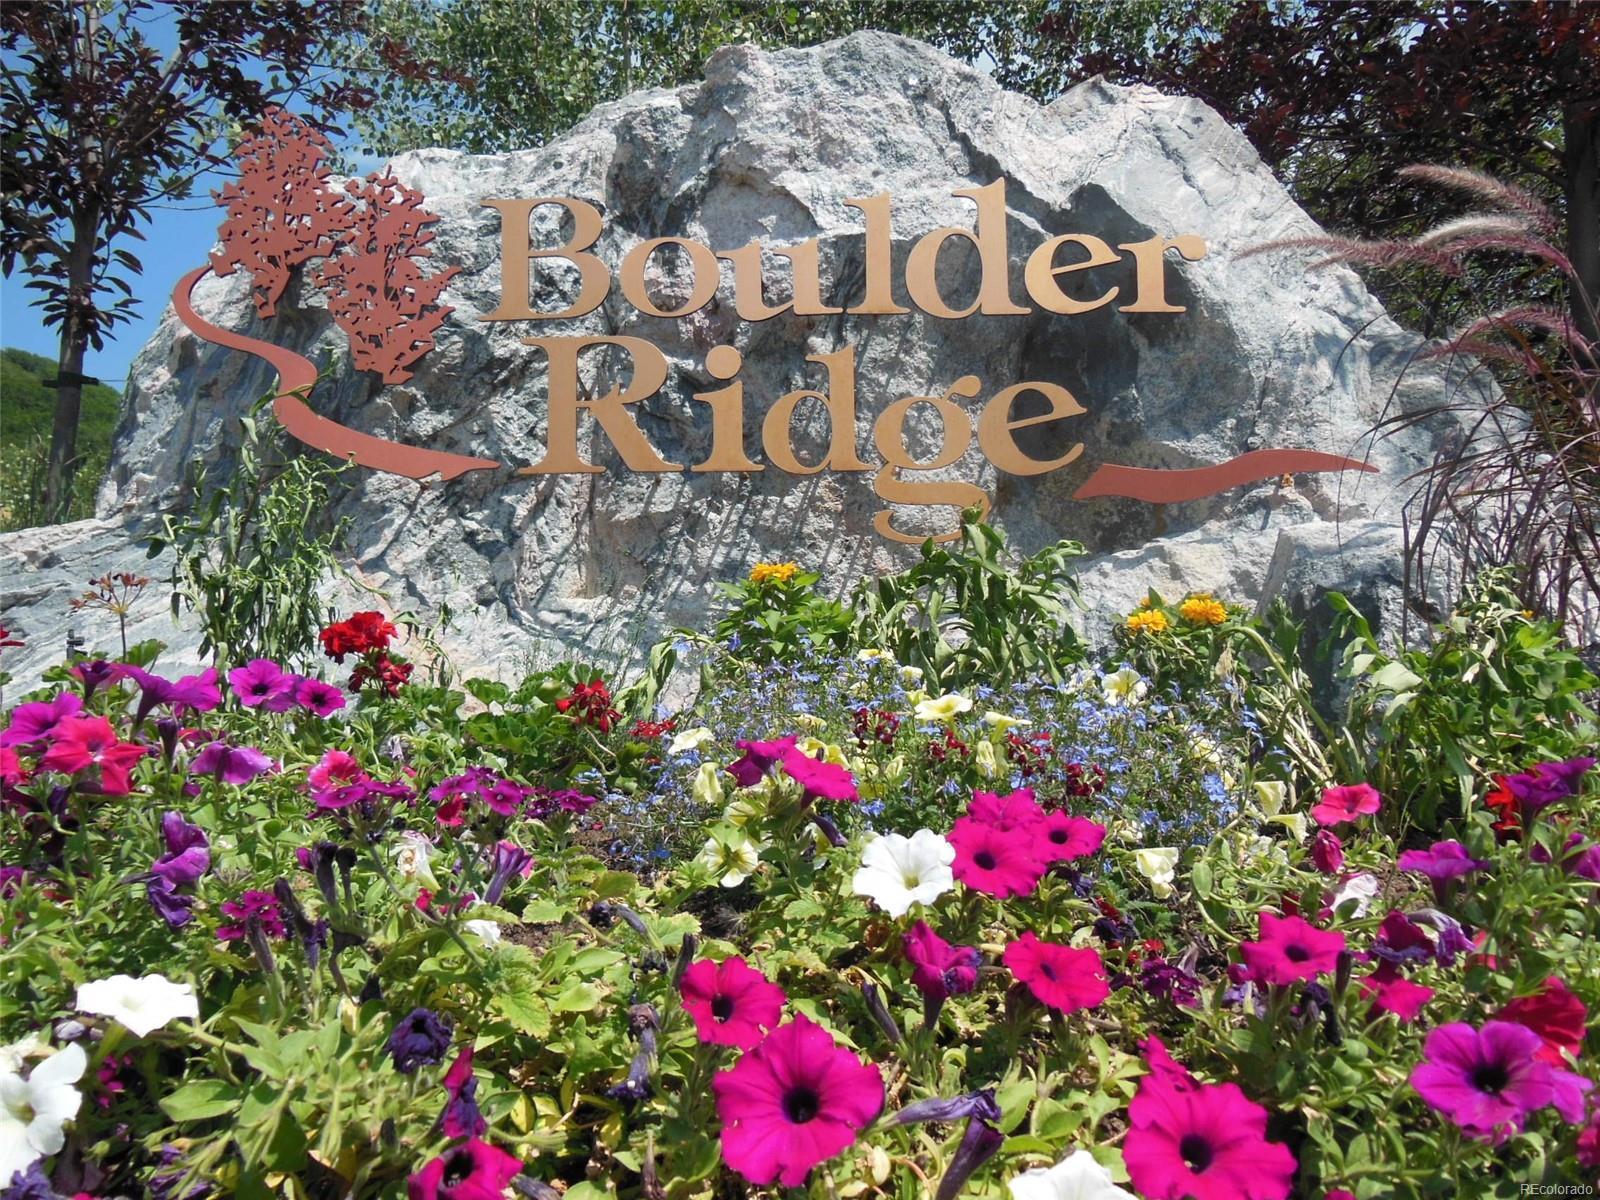 2055 Black Bear Lane, Steamboat Springs, CO 80487 - Steamboat Springs, CO real estate listing